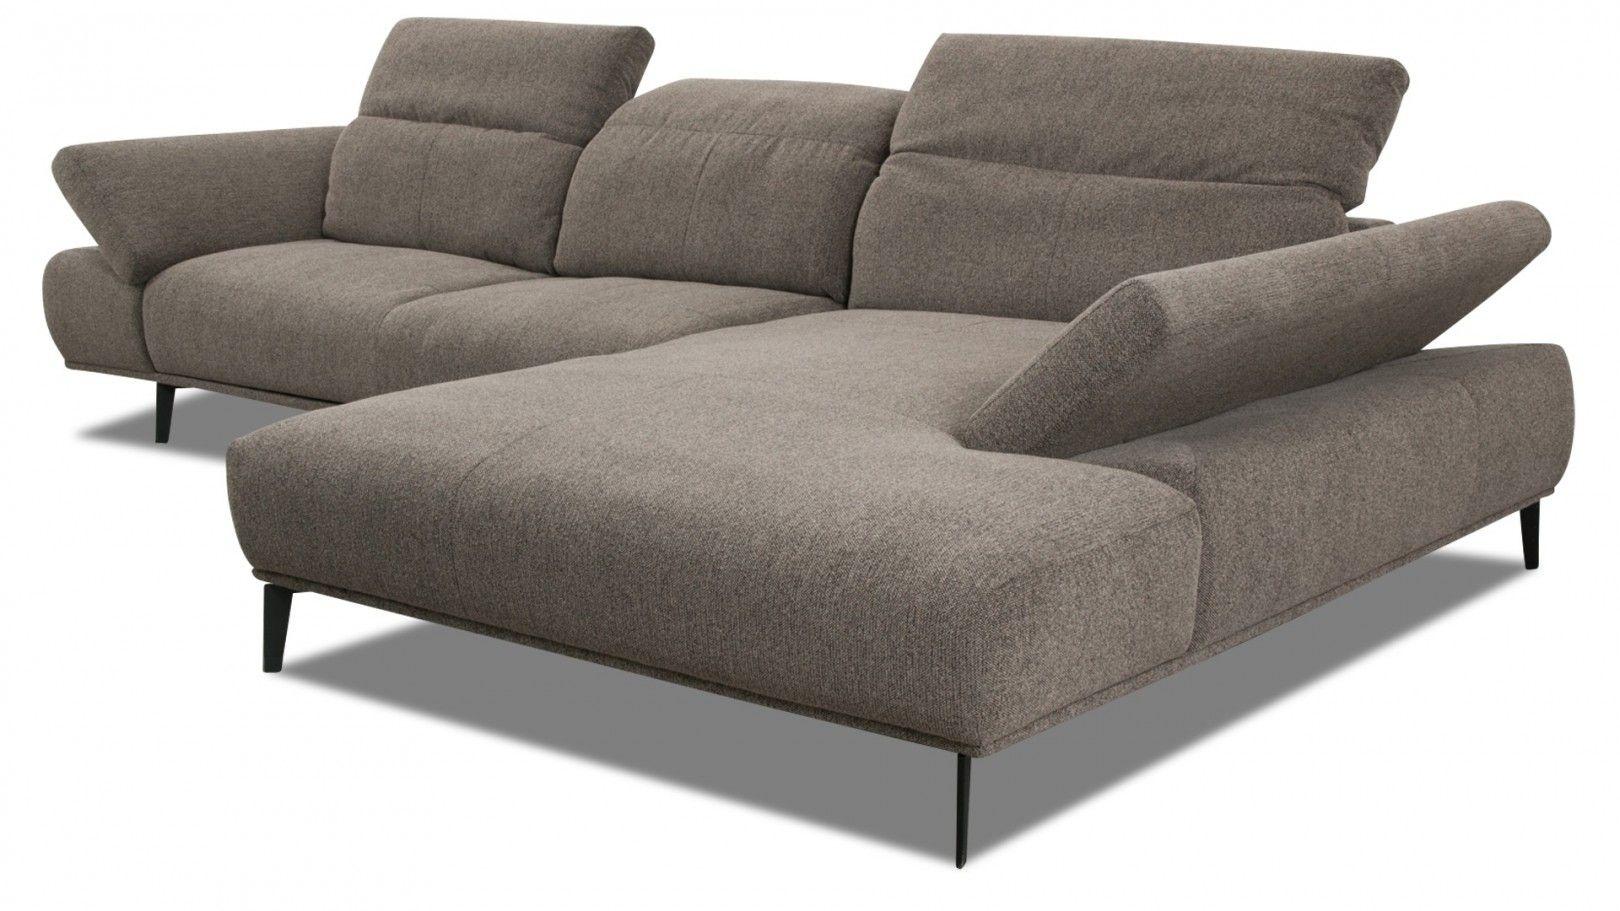 Willi Schillig Ecksofa 24405 Levi In Stoff S22 Pepper Sofa Sofa Outlet Ecksofa